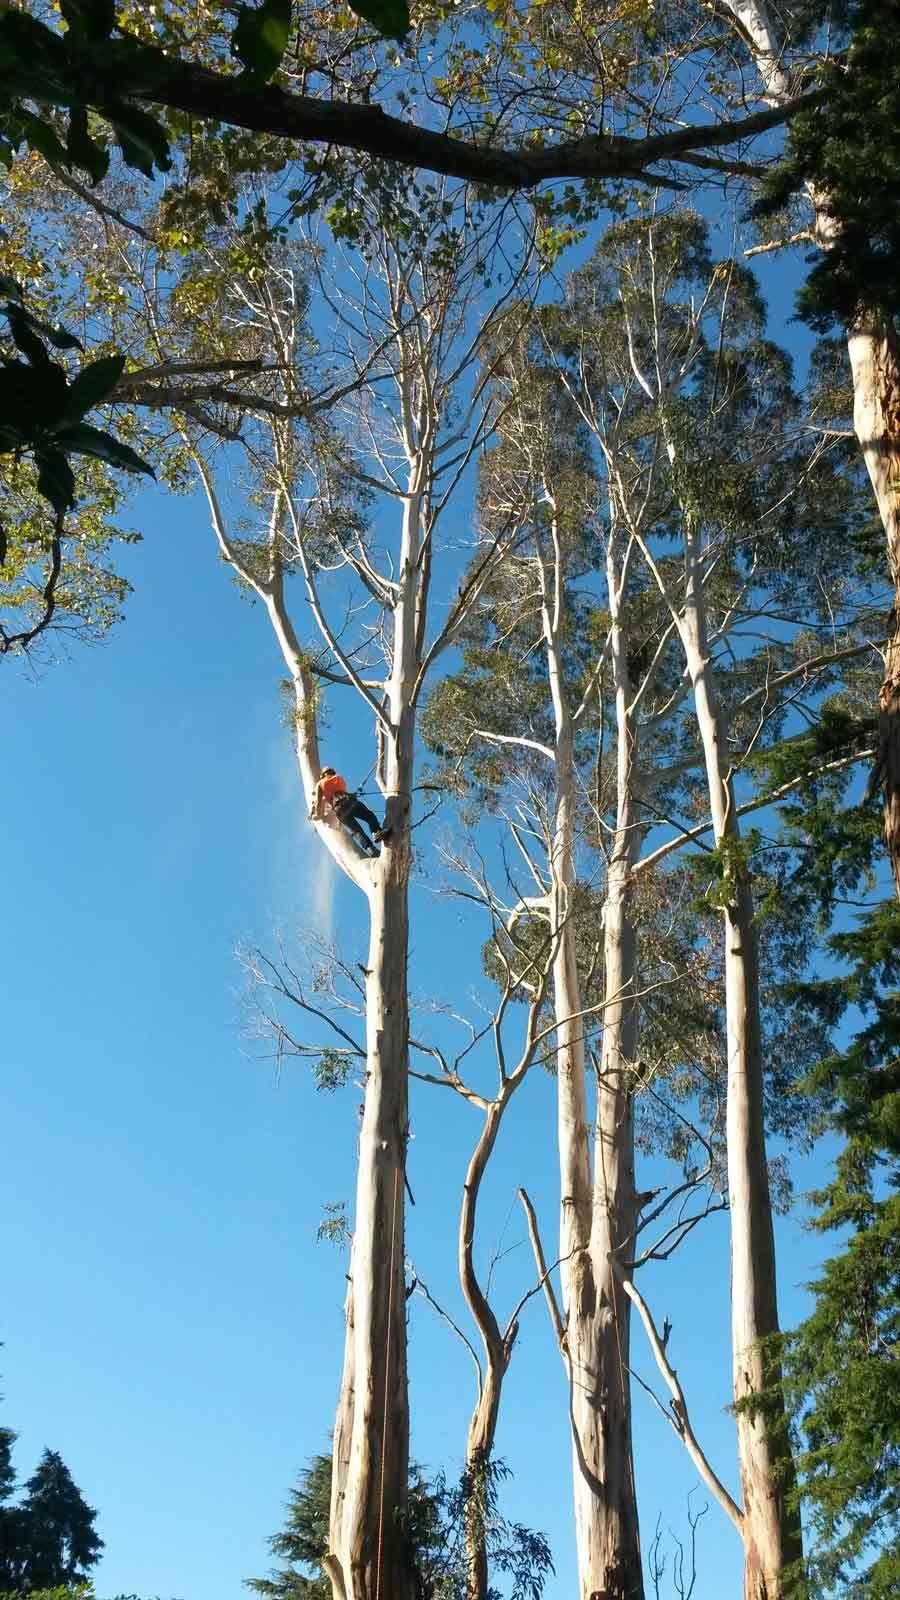 Man performing tree services in Manawatu